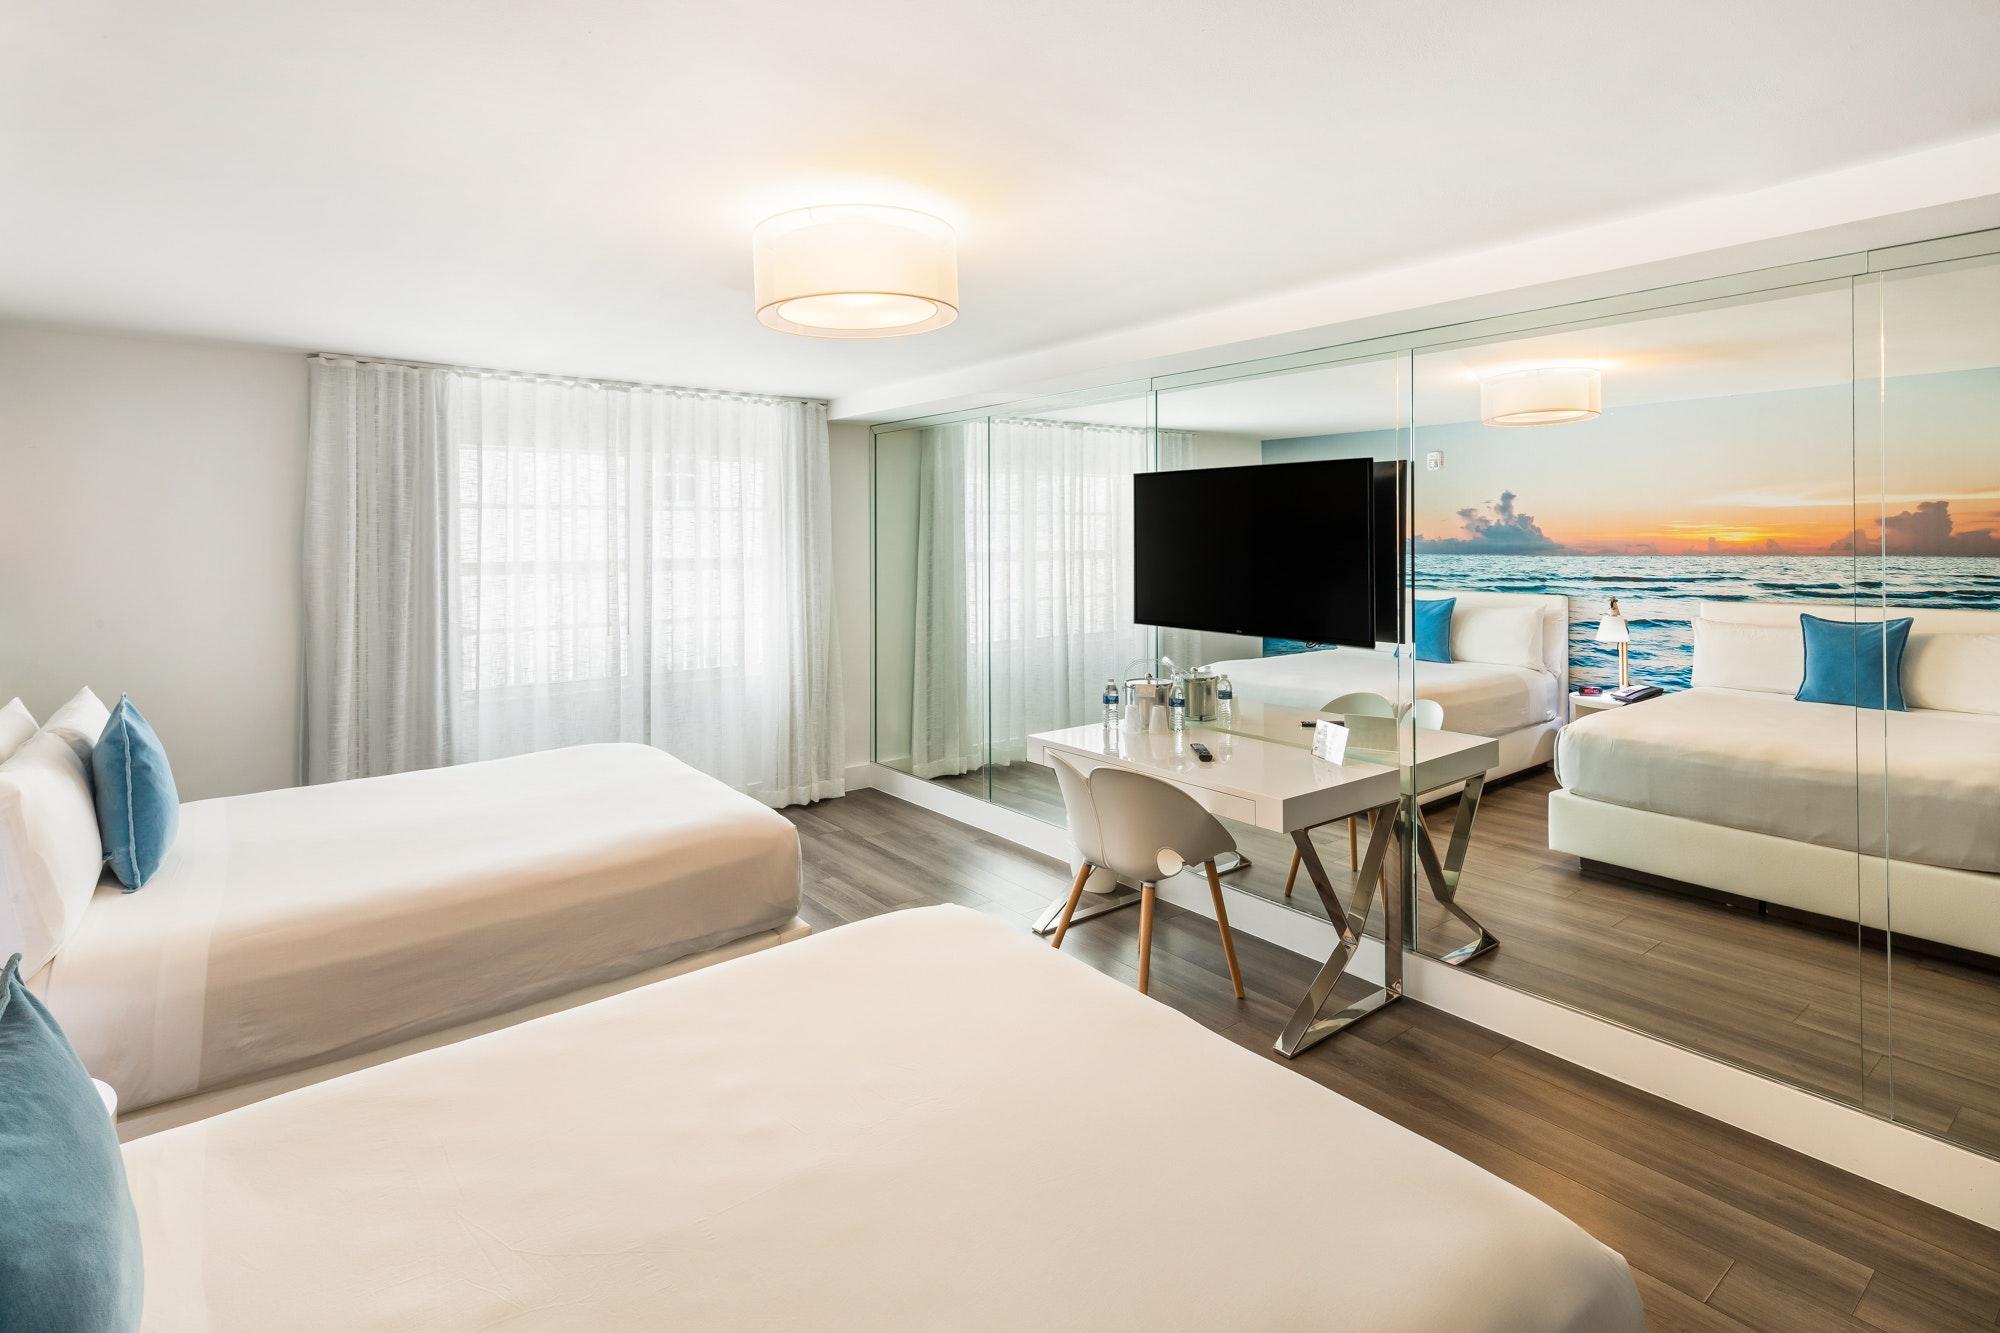 Deluxe Room With 2 Queen Beds President Villa Miami Beach